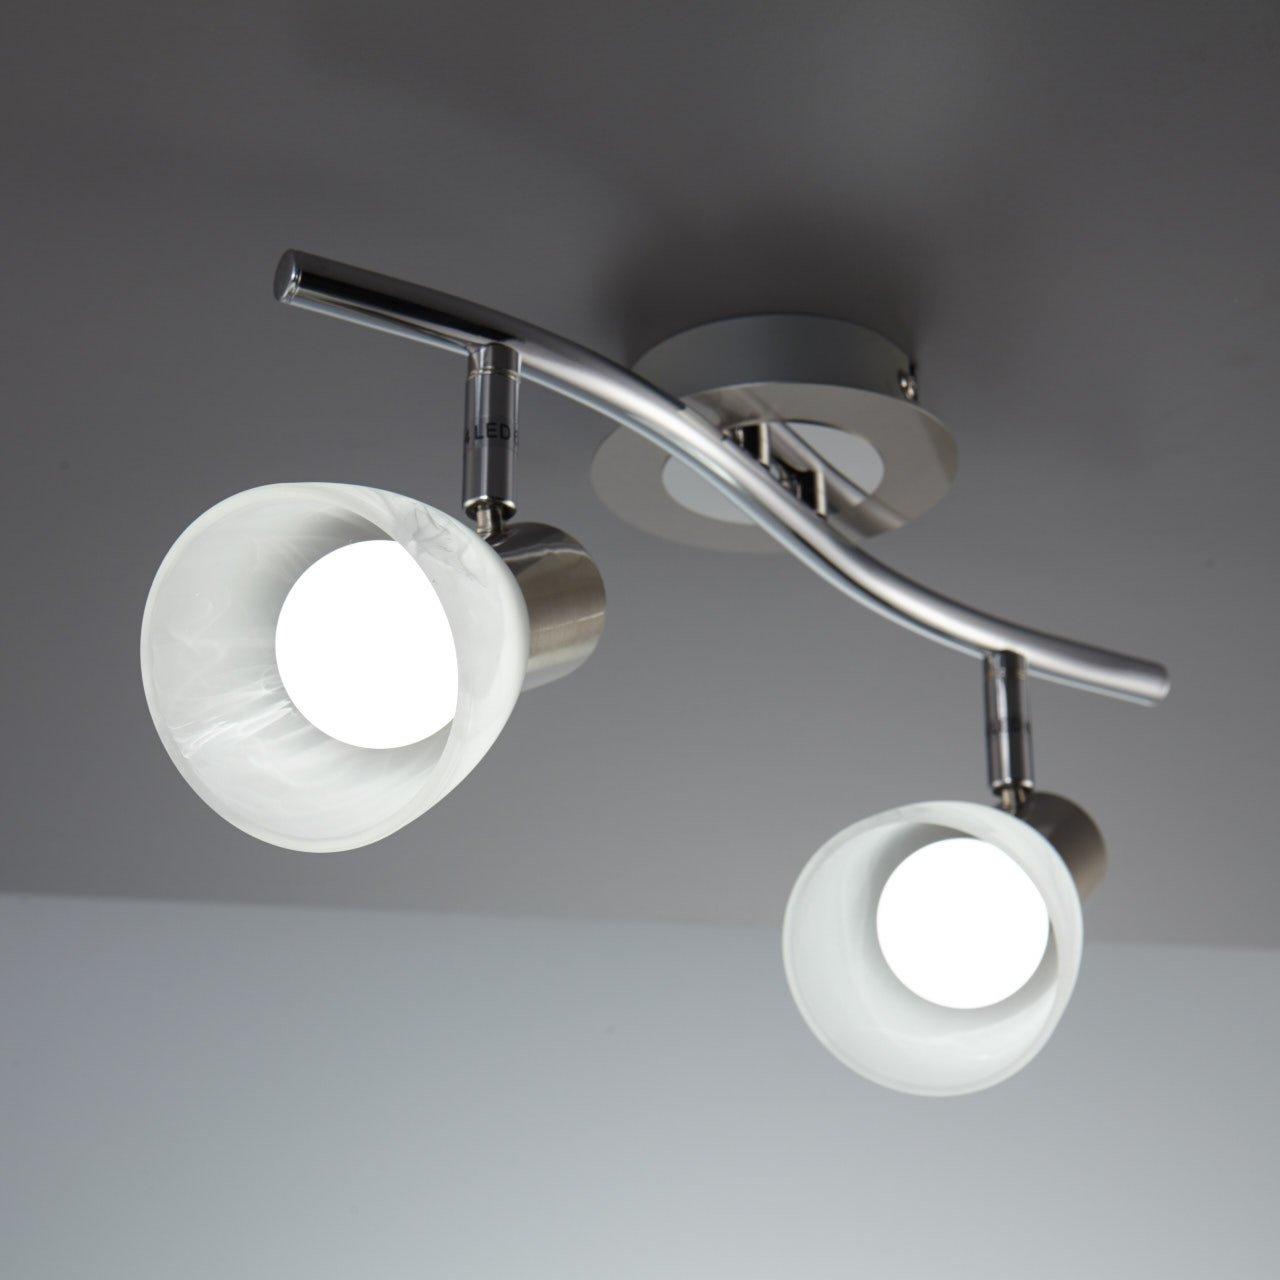 LED Decken-Strahler I 2 flammig I Schlafzimmer-Leuchte I drehbar I ...